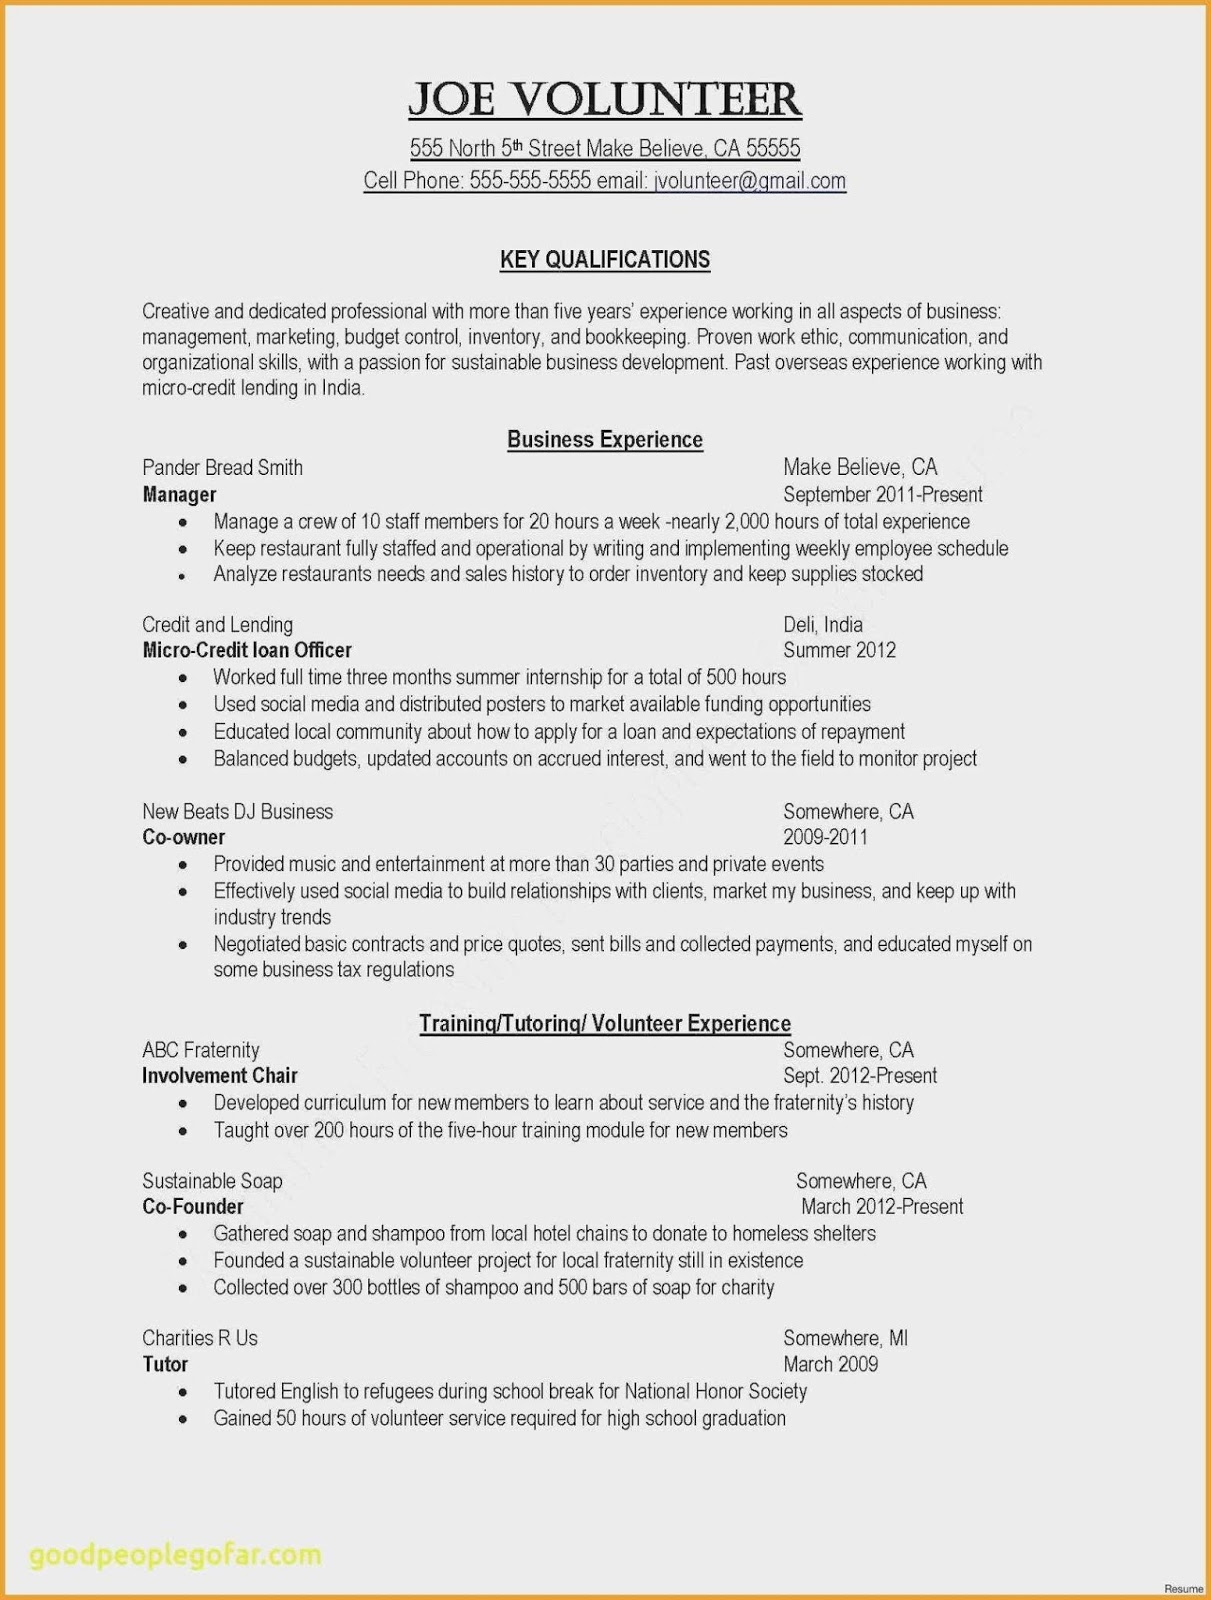 marriage resume template marriage resume template word marriage resume template download marriage cv template download marriage cv template doc resume template for marriage sample resume marriage profile template resume templates for marriage marriage resume templates word